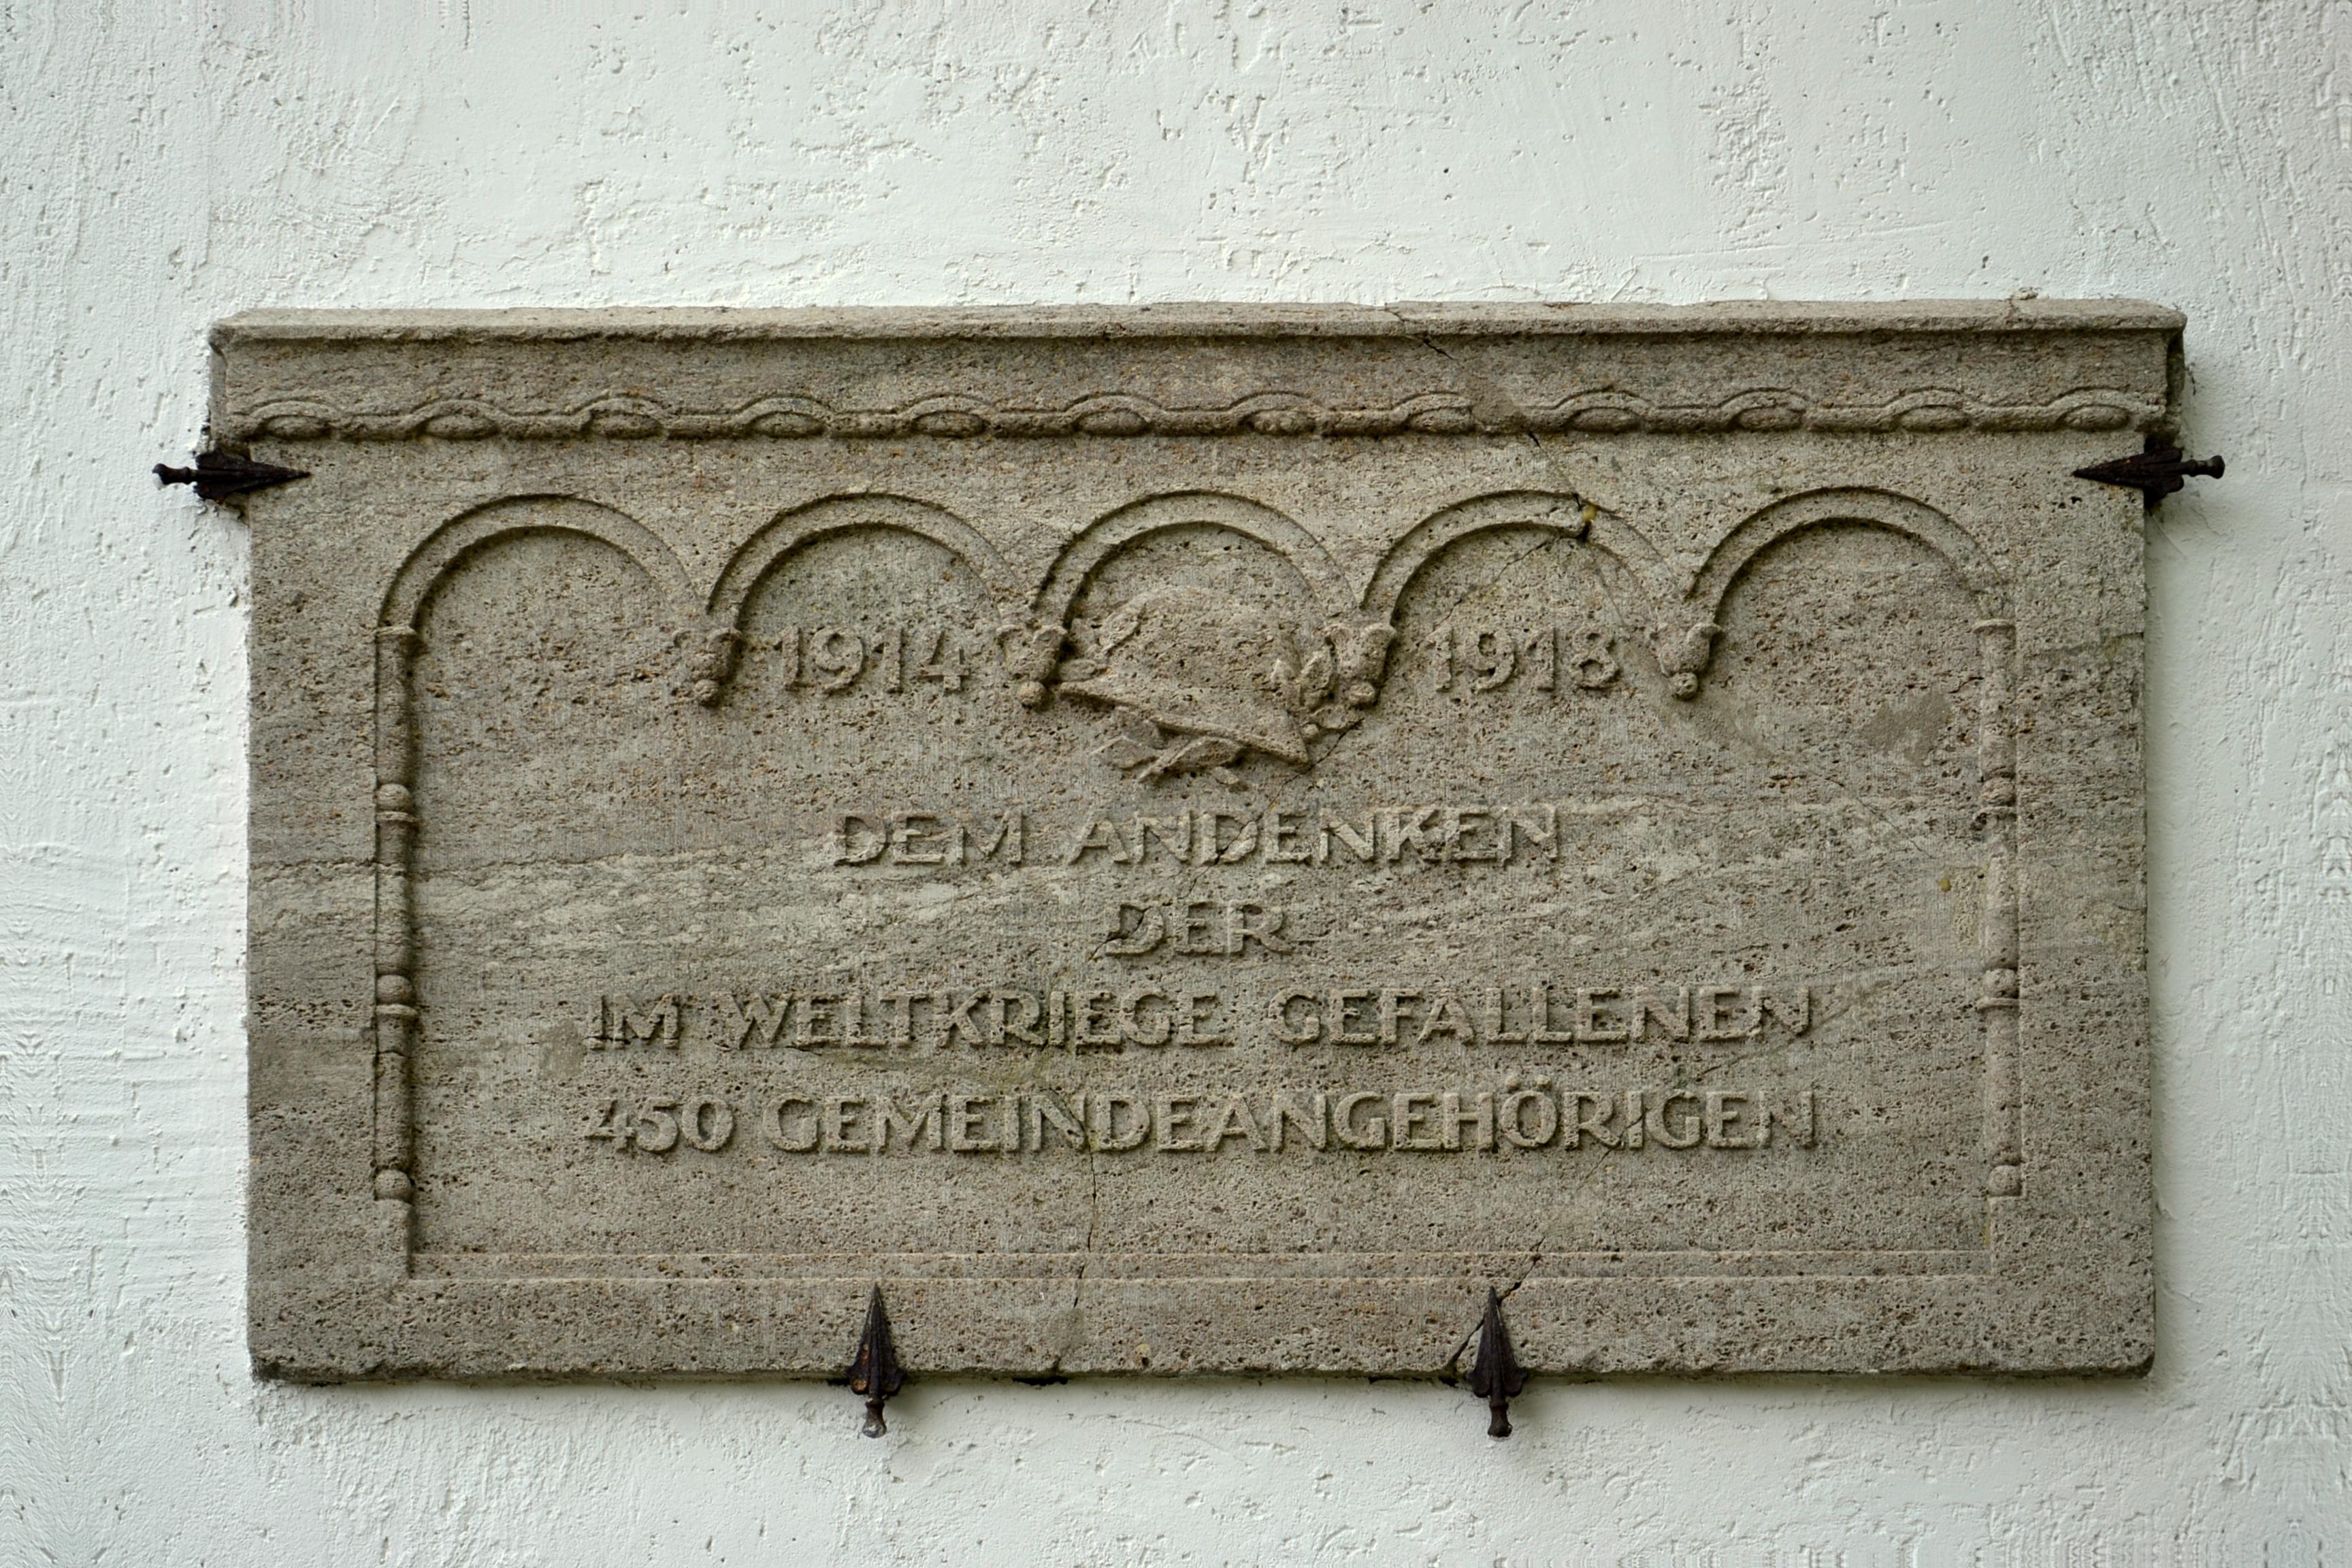 https://upload.wikimedia.org/wikipedia/commons/f/f1/Wroc%C5%82aw_%28Breslau%29_Old_Jewish_Cemetery_-_by_Pudelek_06.JPG